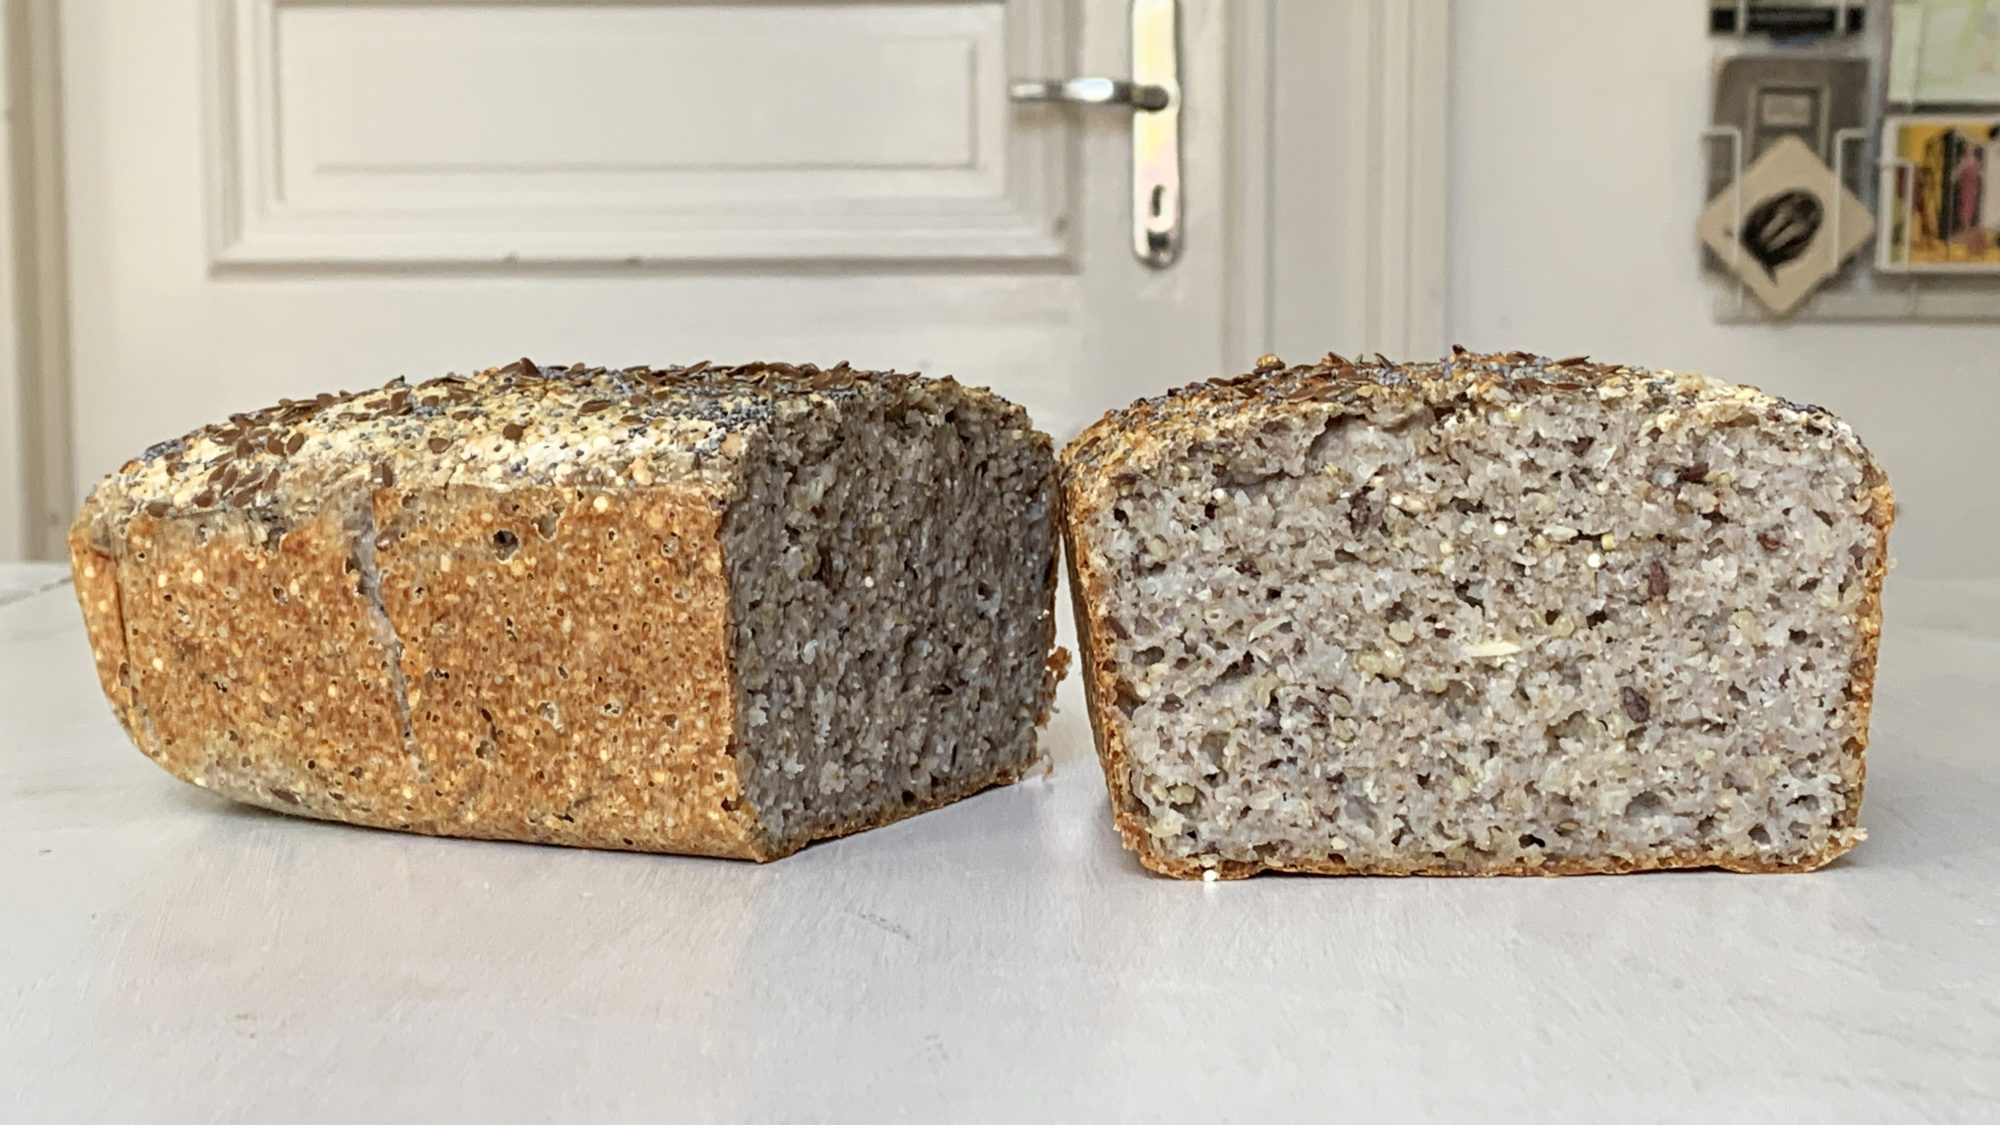 Glutenfreies Sauerteig-Buchweizenbrot